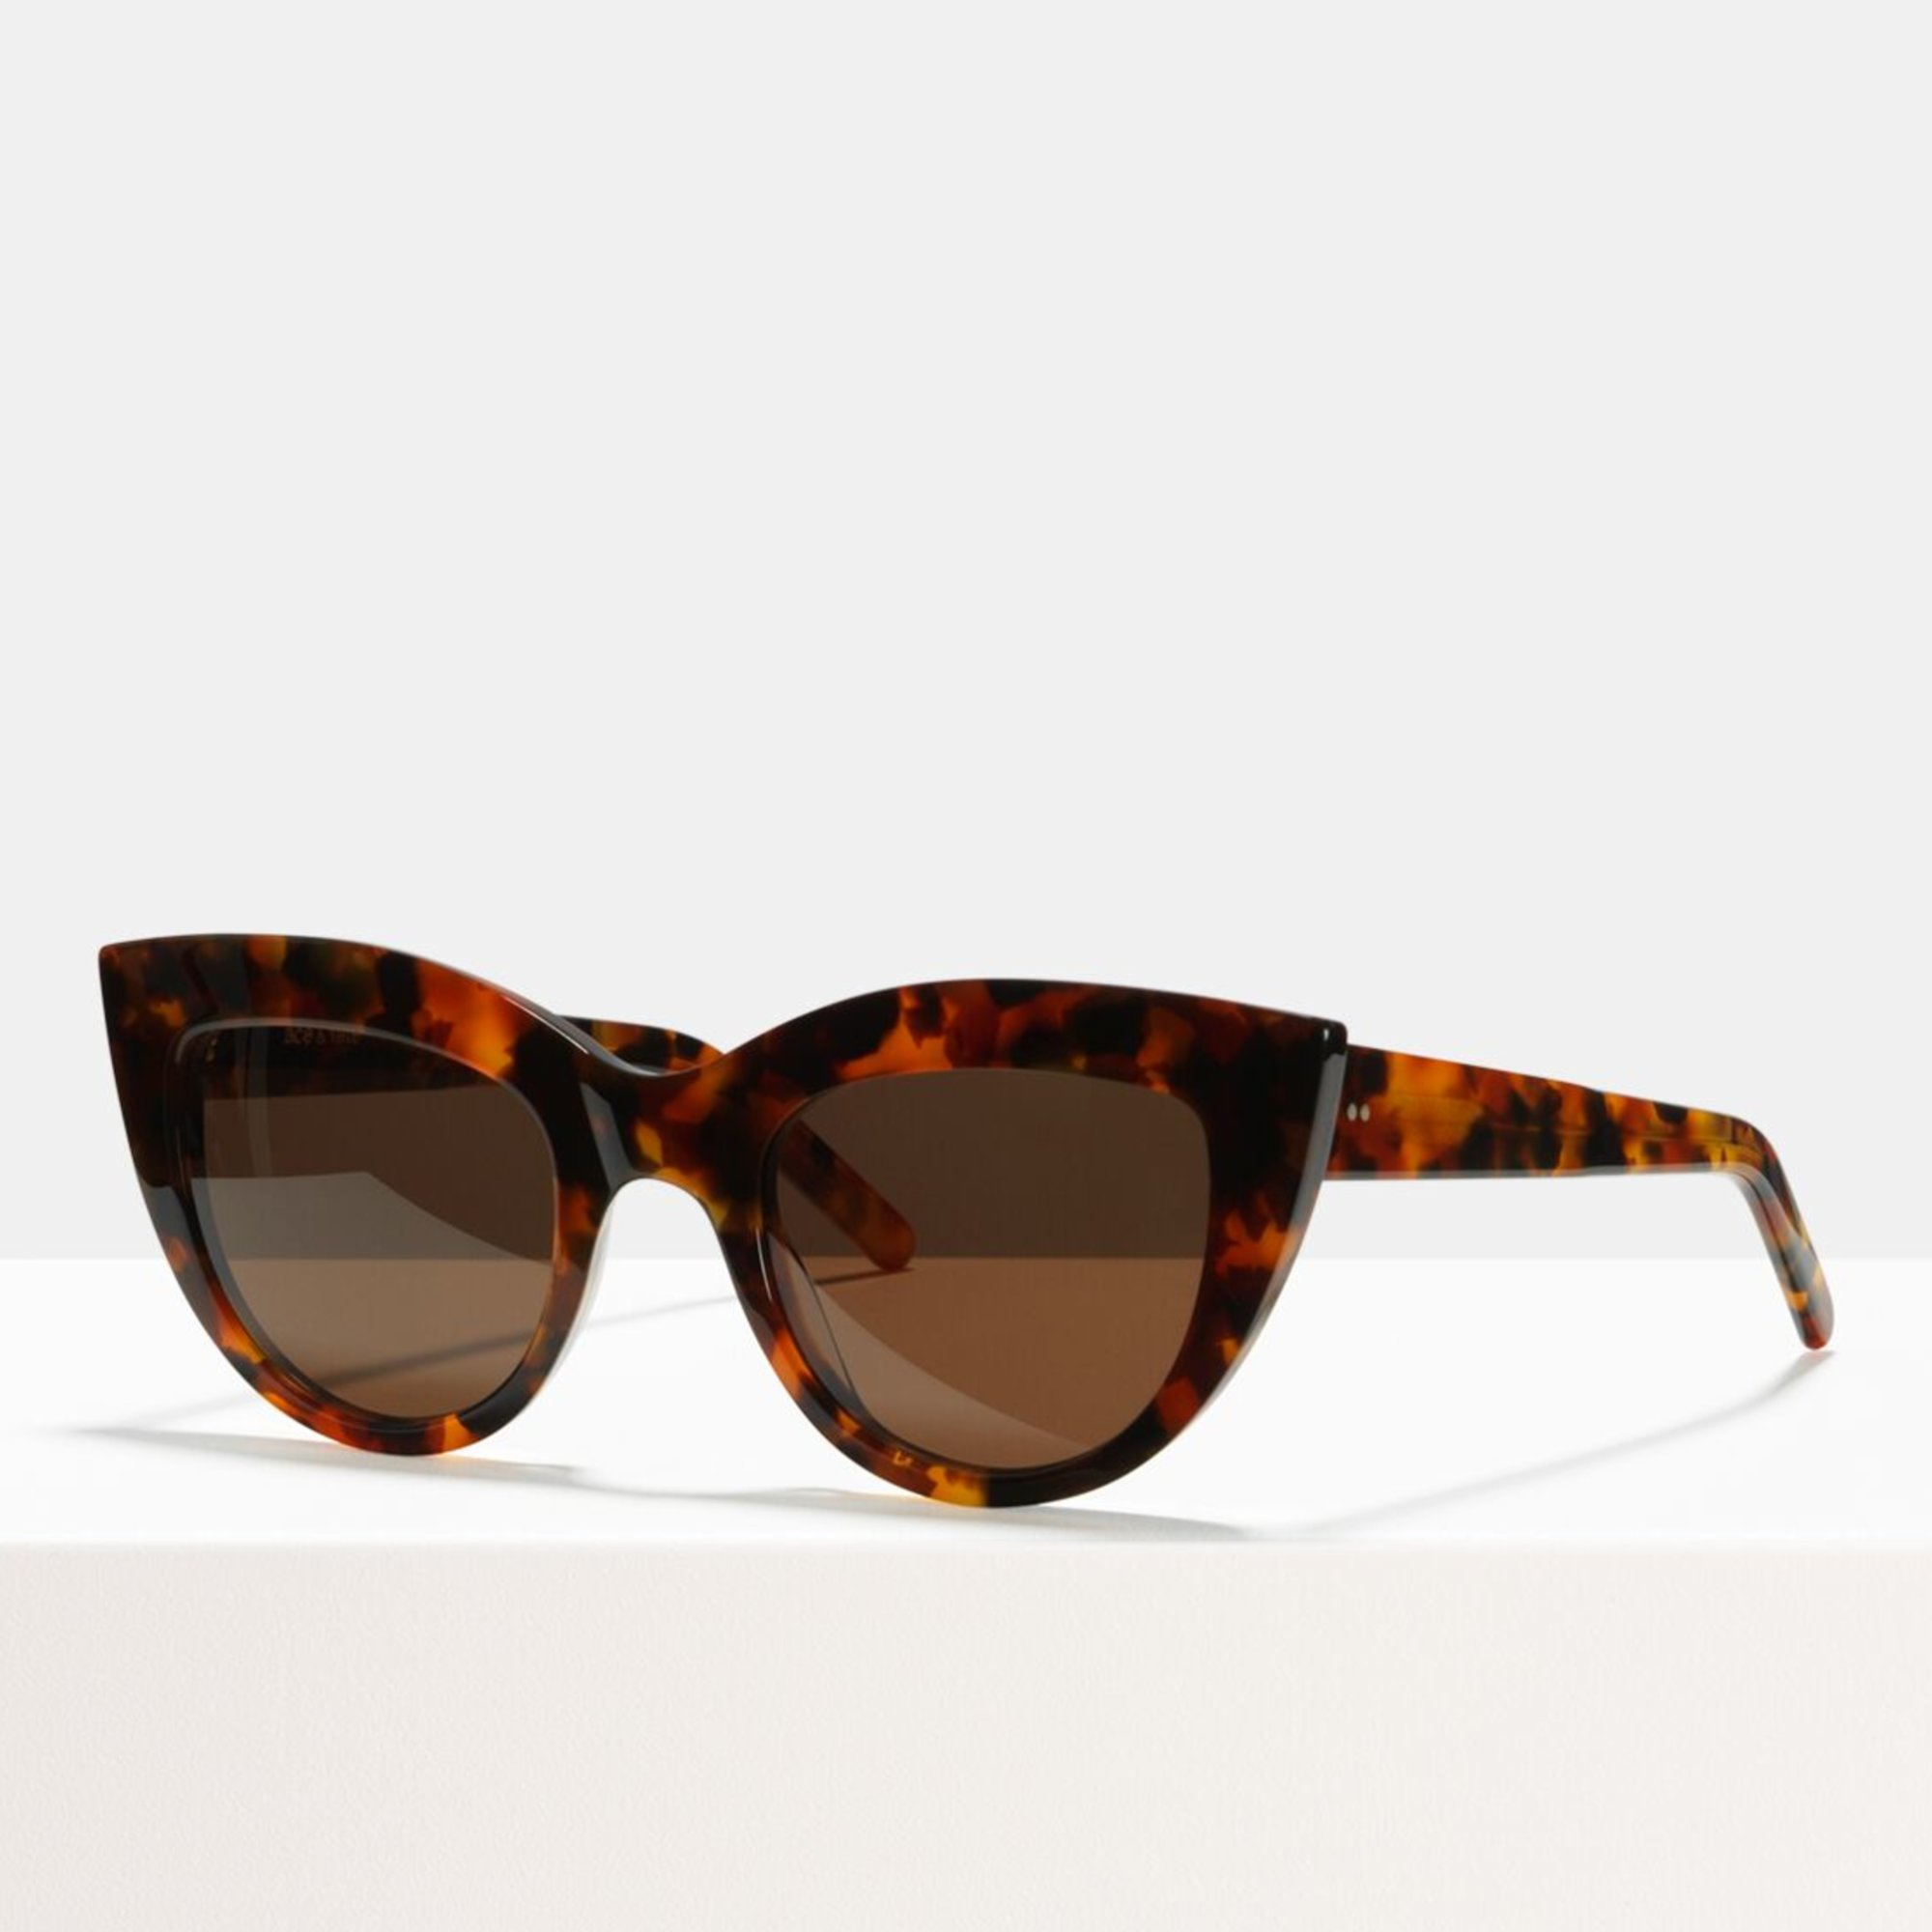 Ace & Tate Sunglasses |  acetaat in Bruin, Oranje